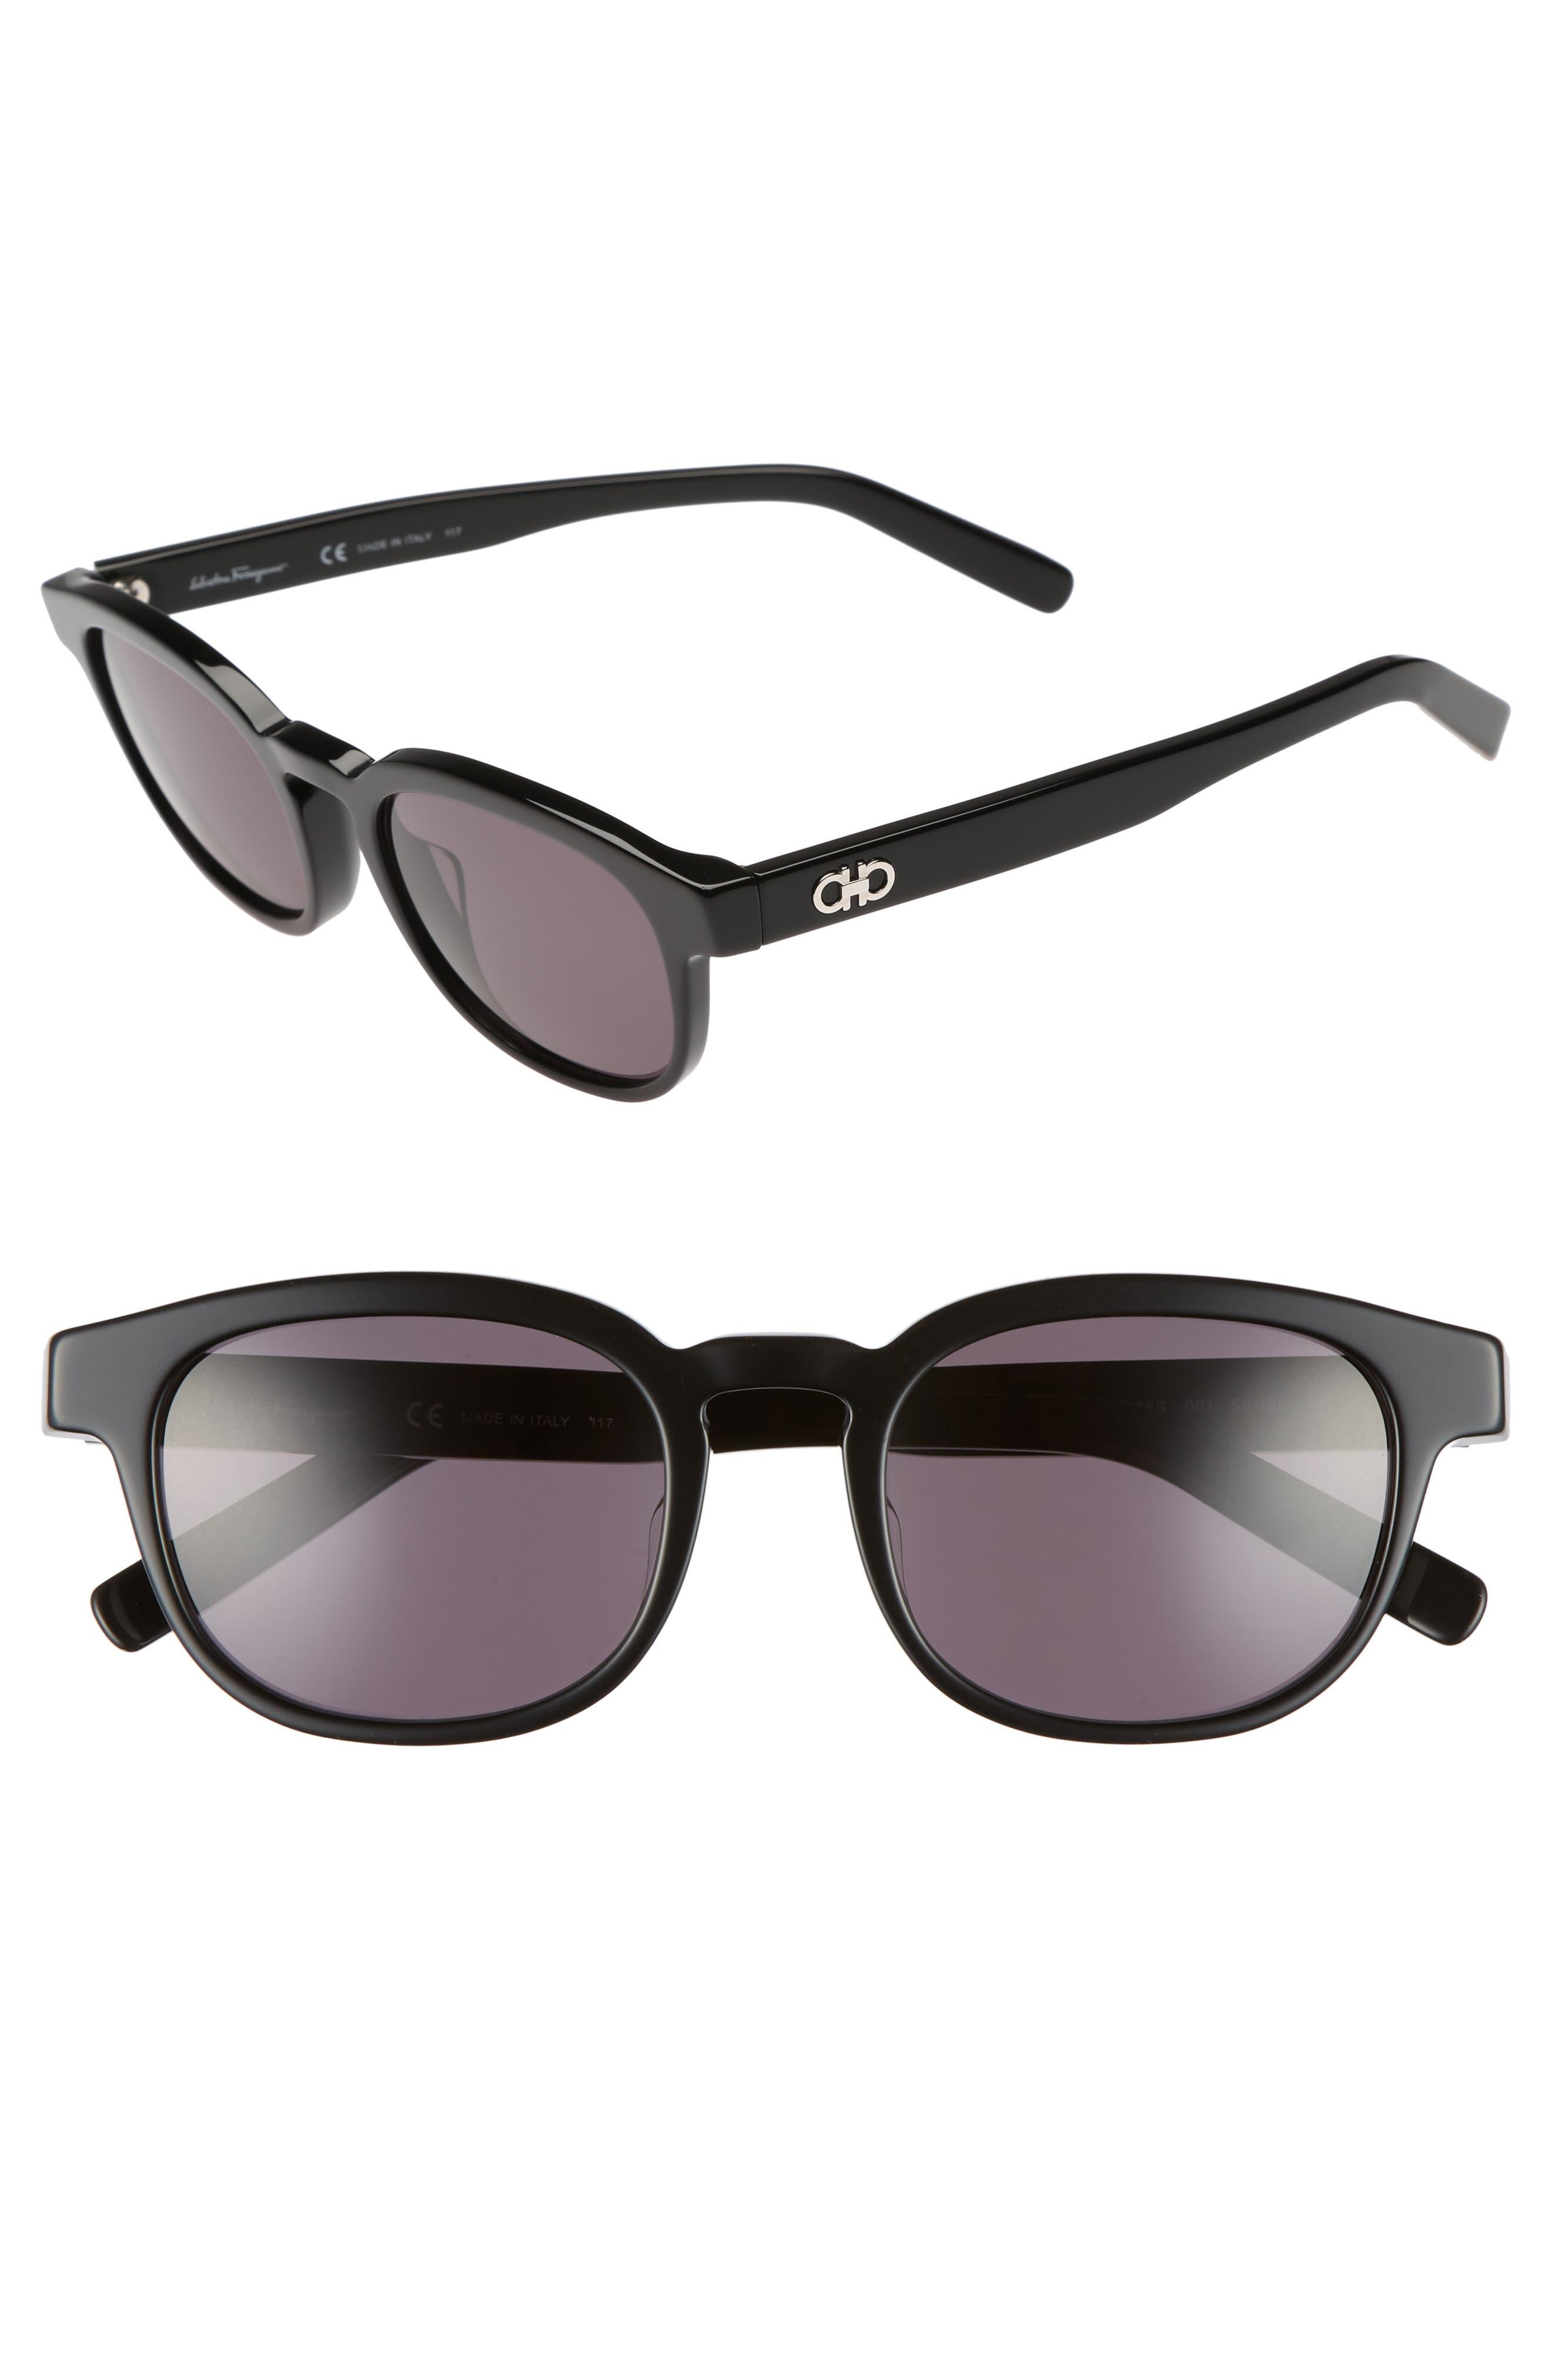 866S 50mm Sunglasses,                         Main,                         color, BLACK